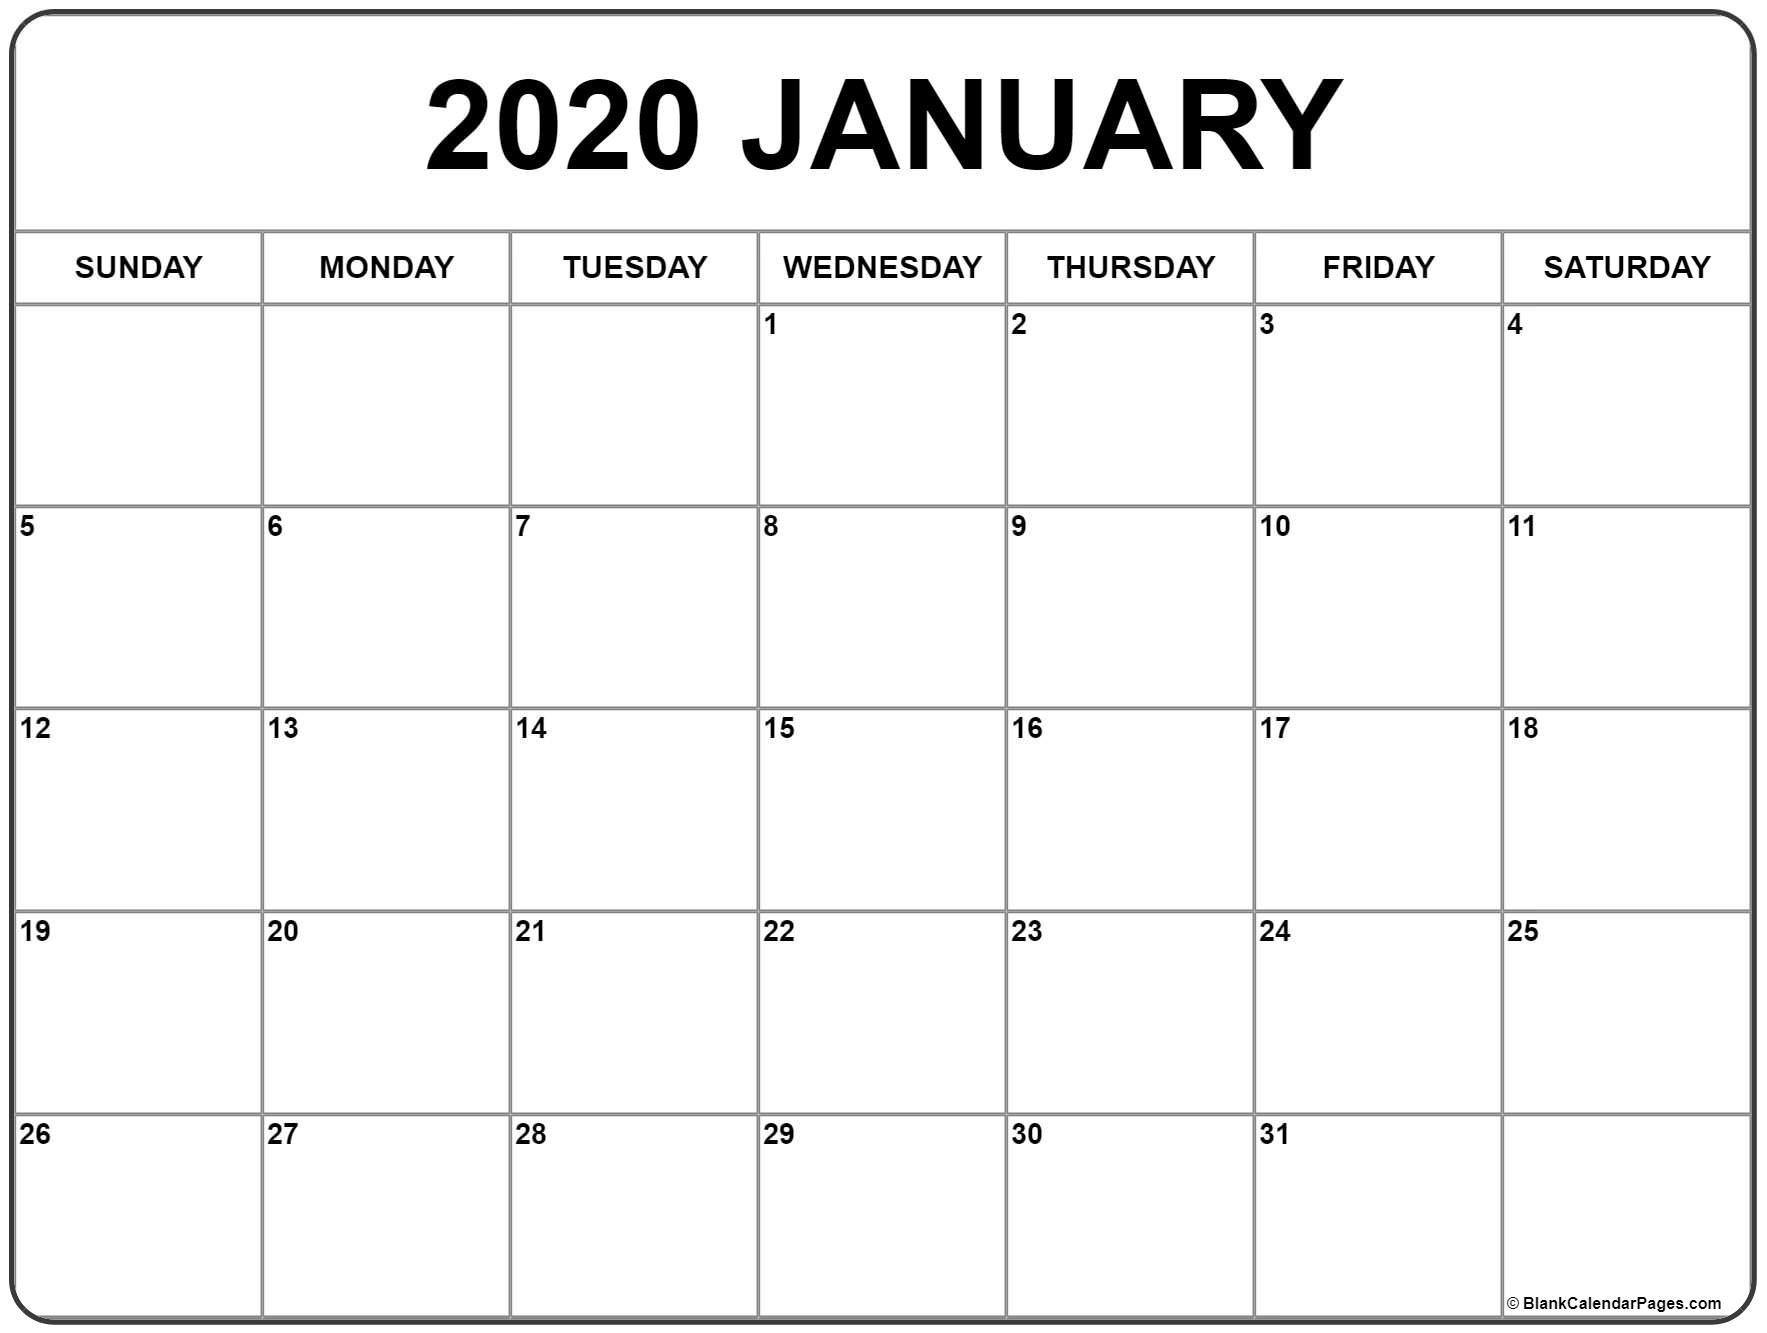 January 2020 Calendar | Free Printable Monthly Calendars  Free Download Printable 2020 Monthly Calendar